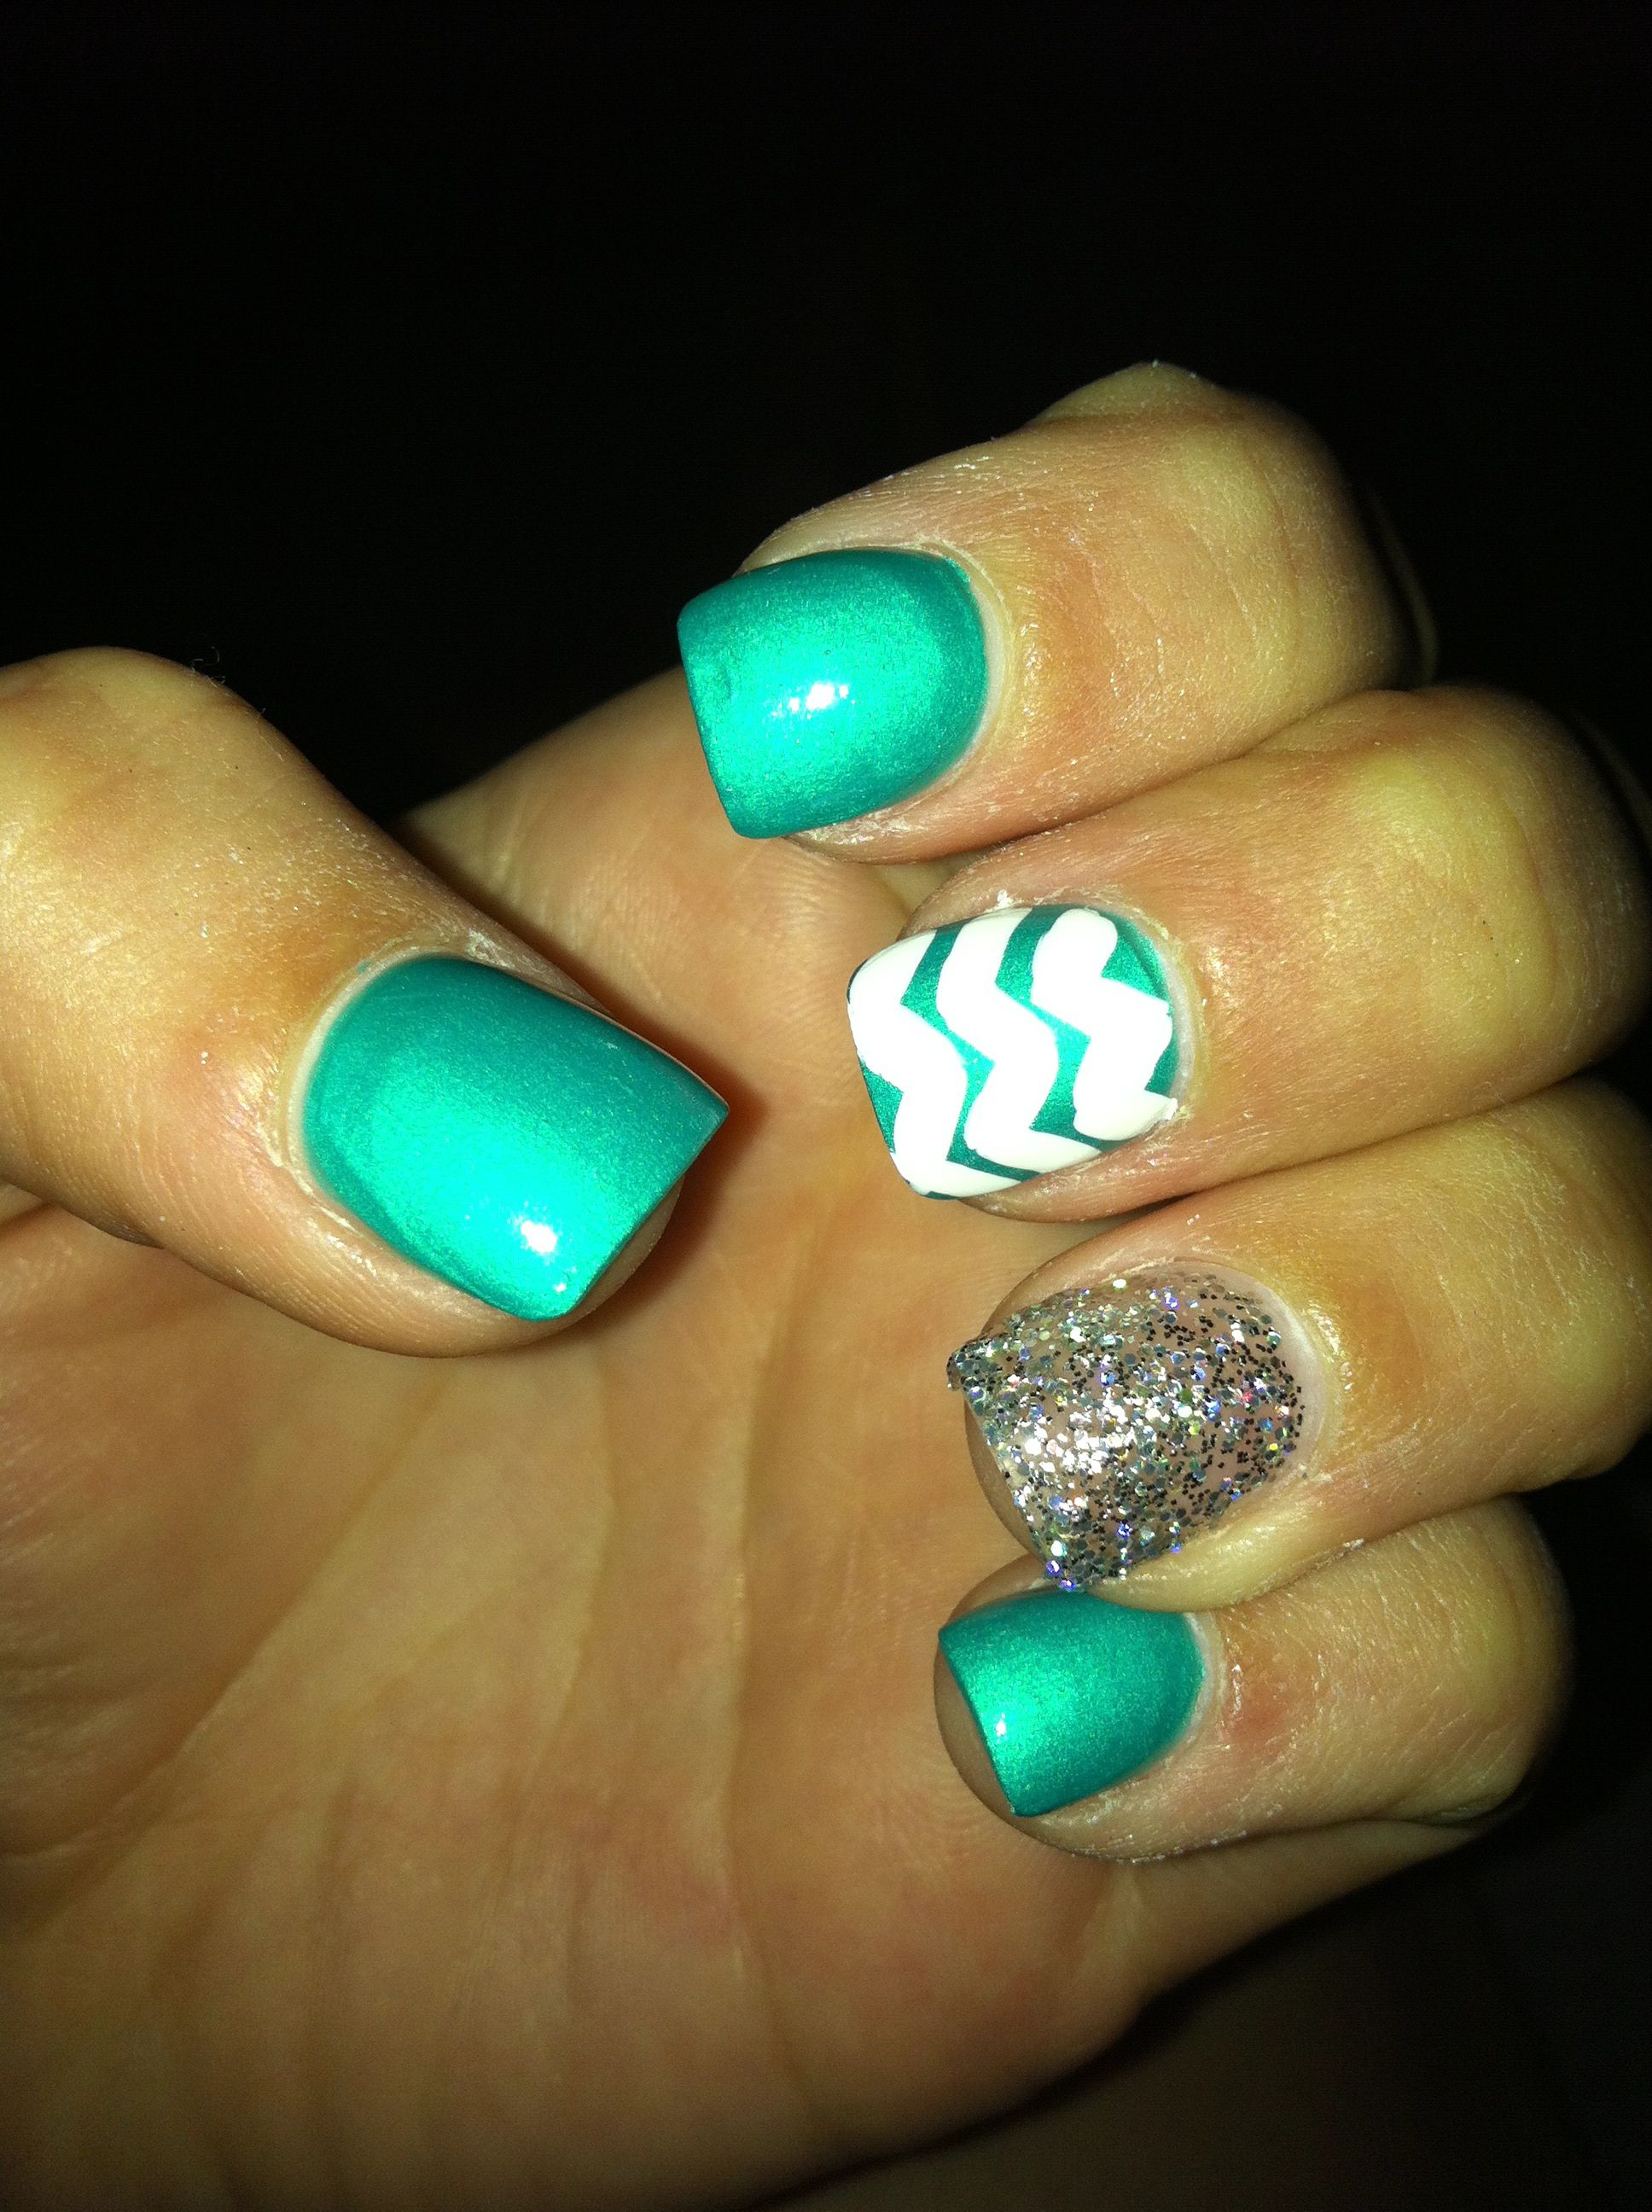 Nails #nails Http://pinterest.com/ahaishopping/ Free Nail